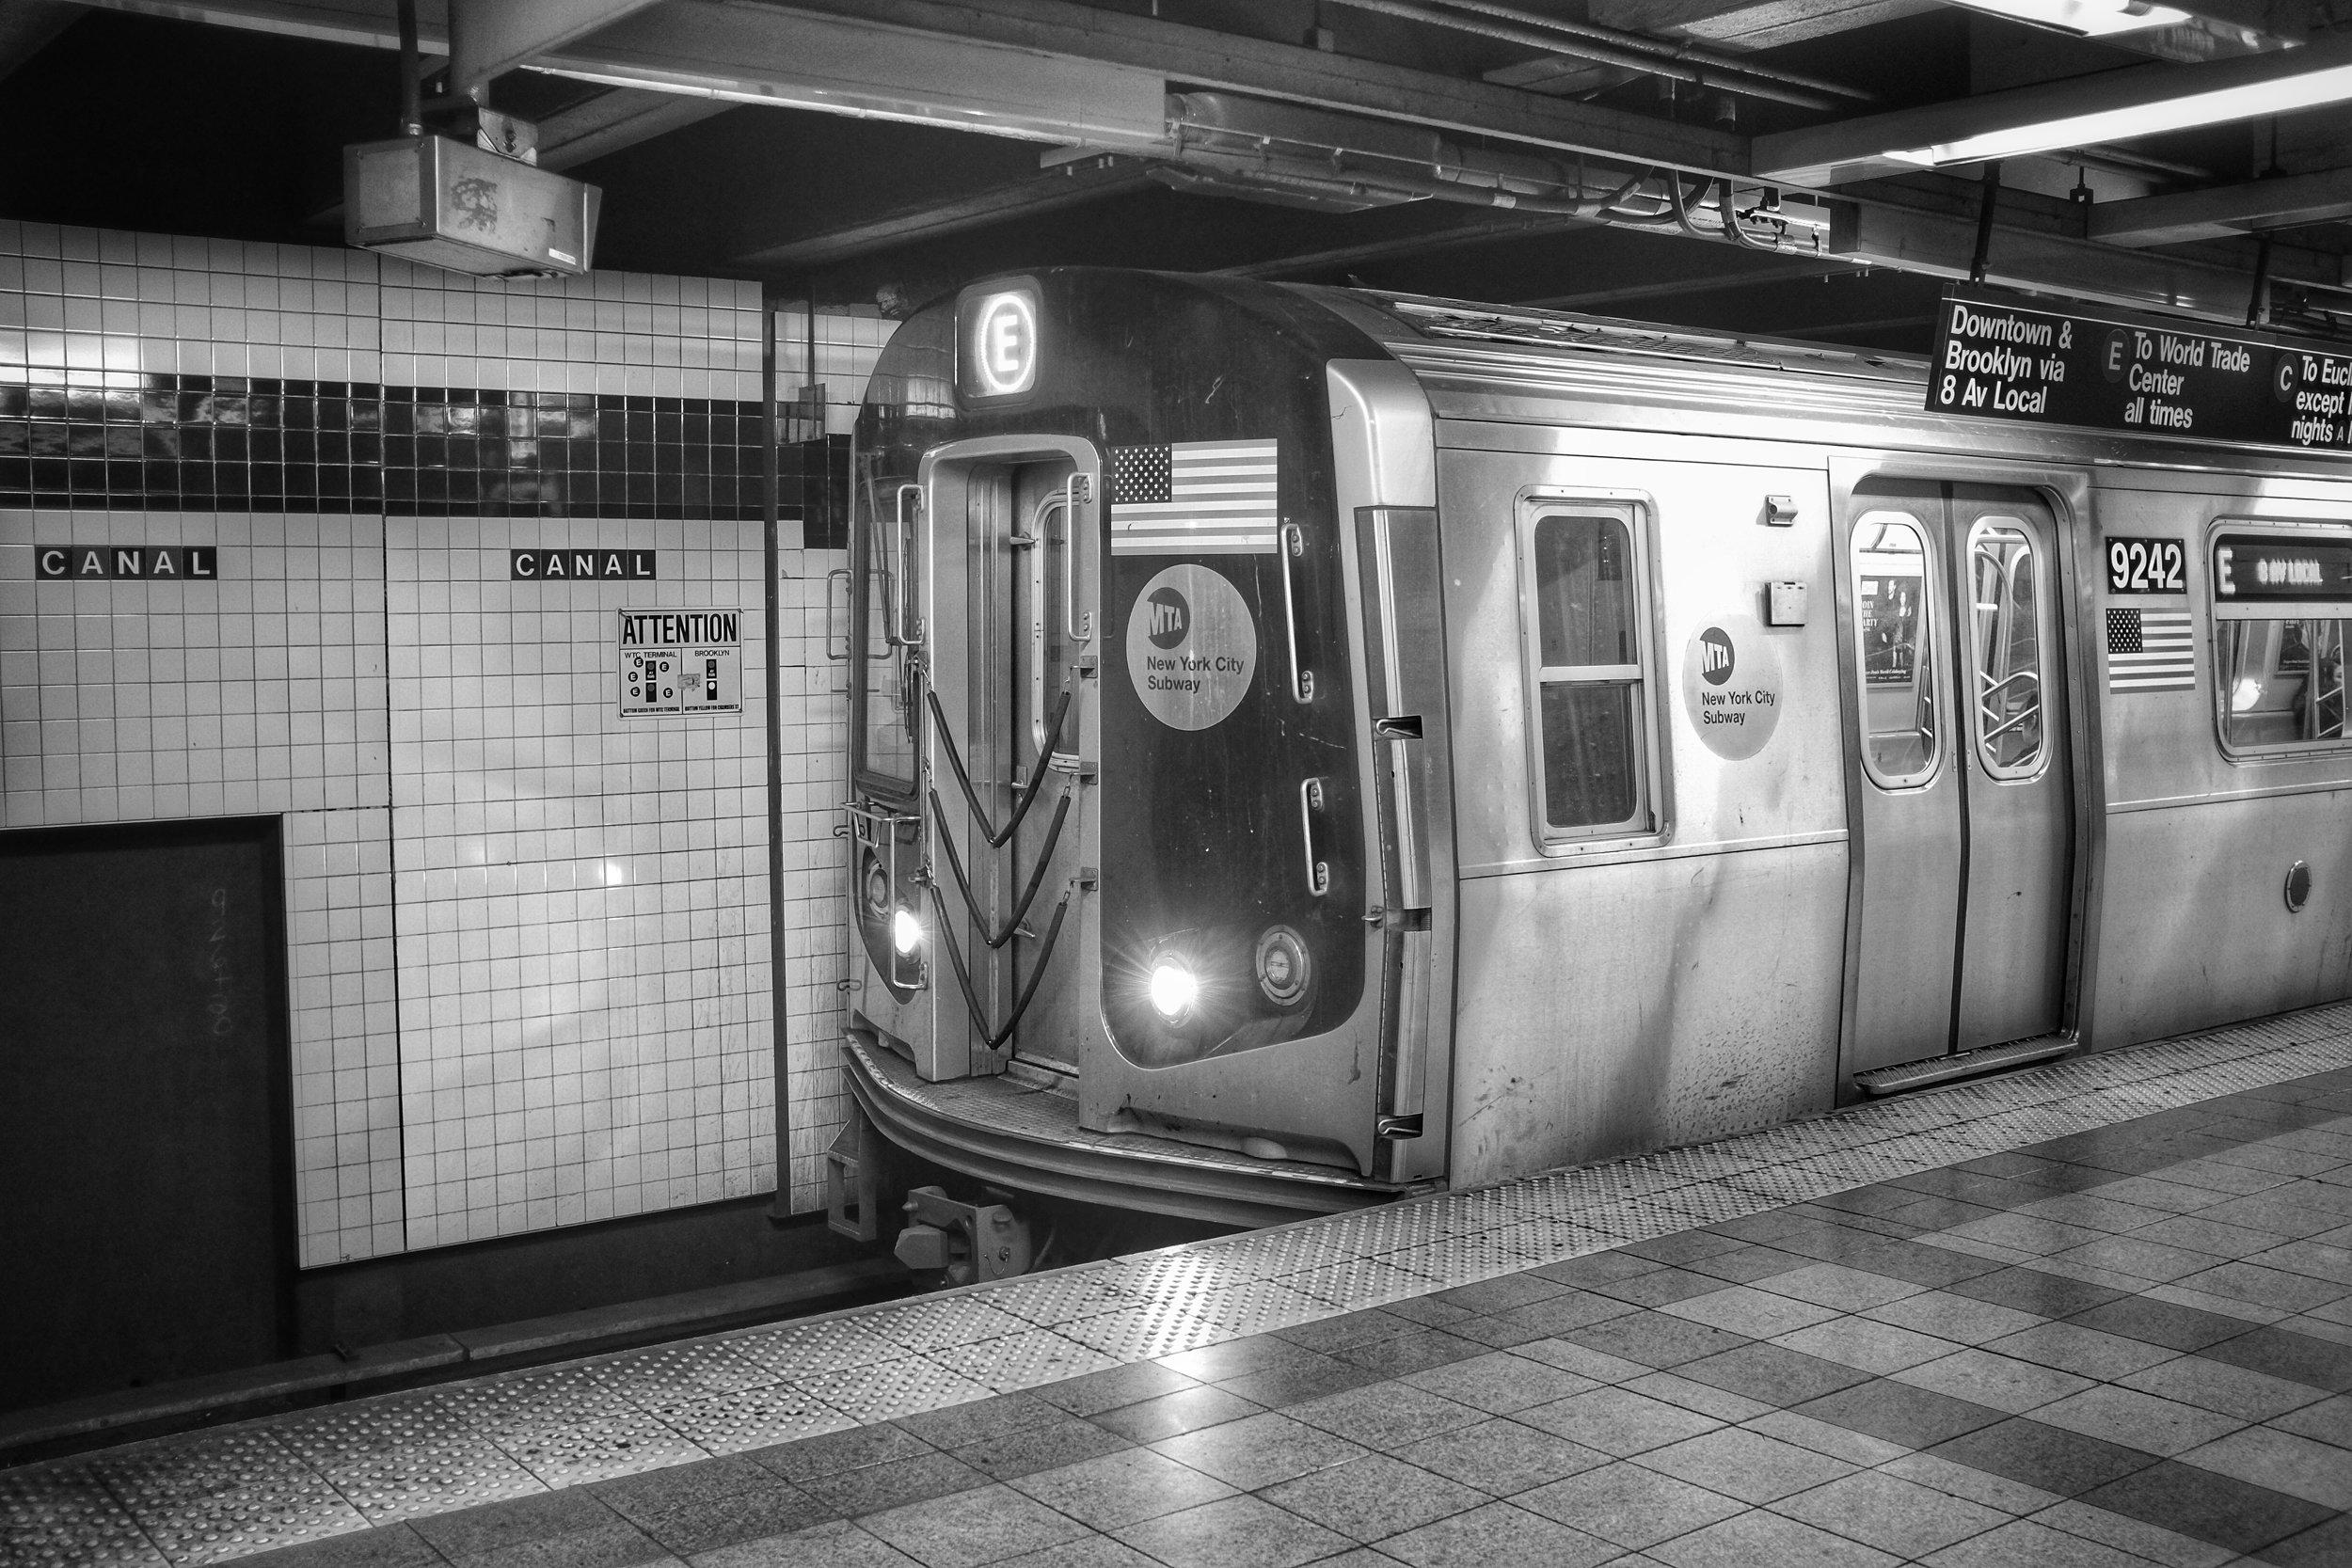 E Train. Canal Street Station. TriBeCa. New York City. 2016.